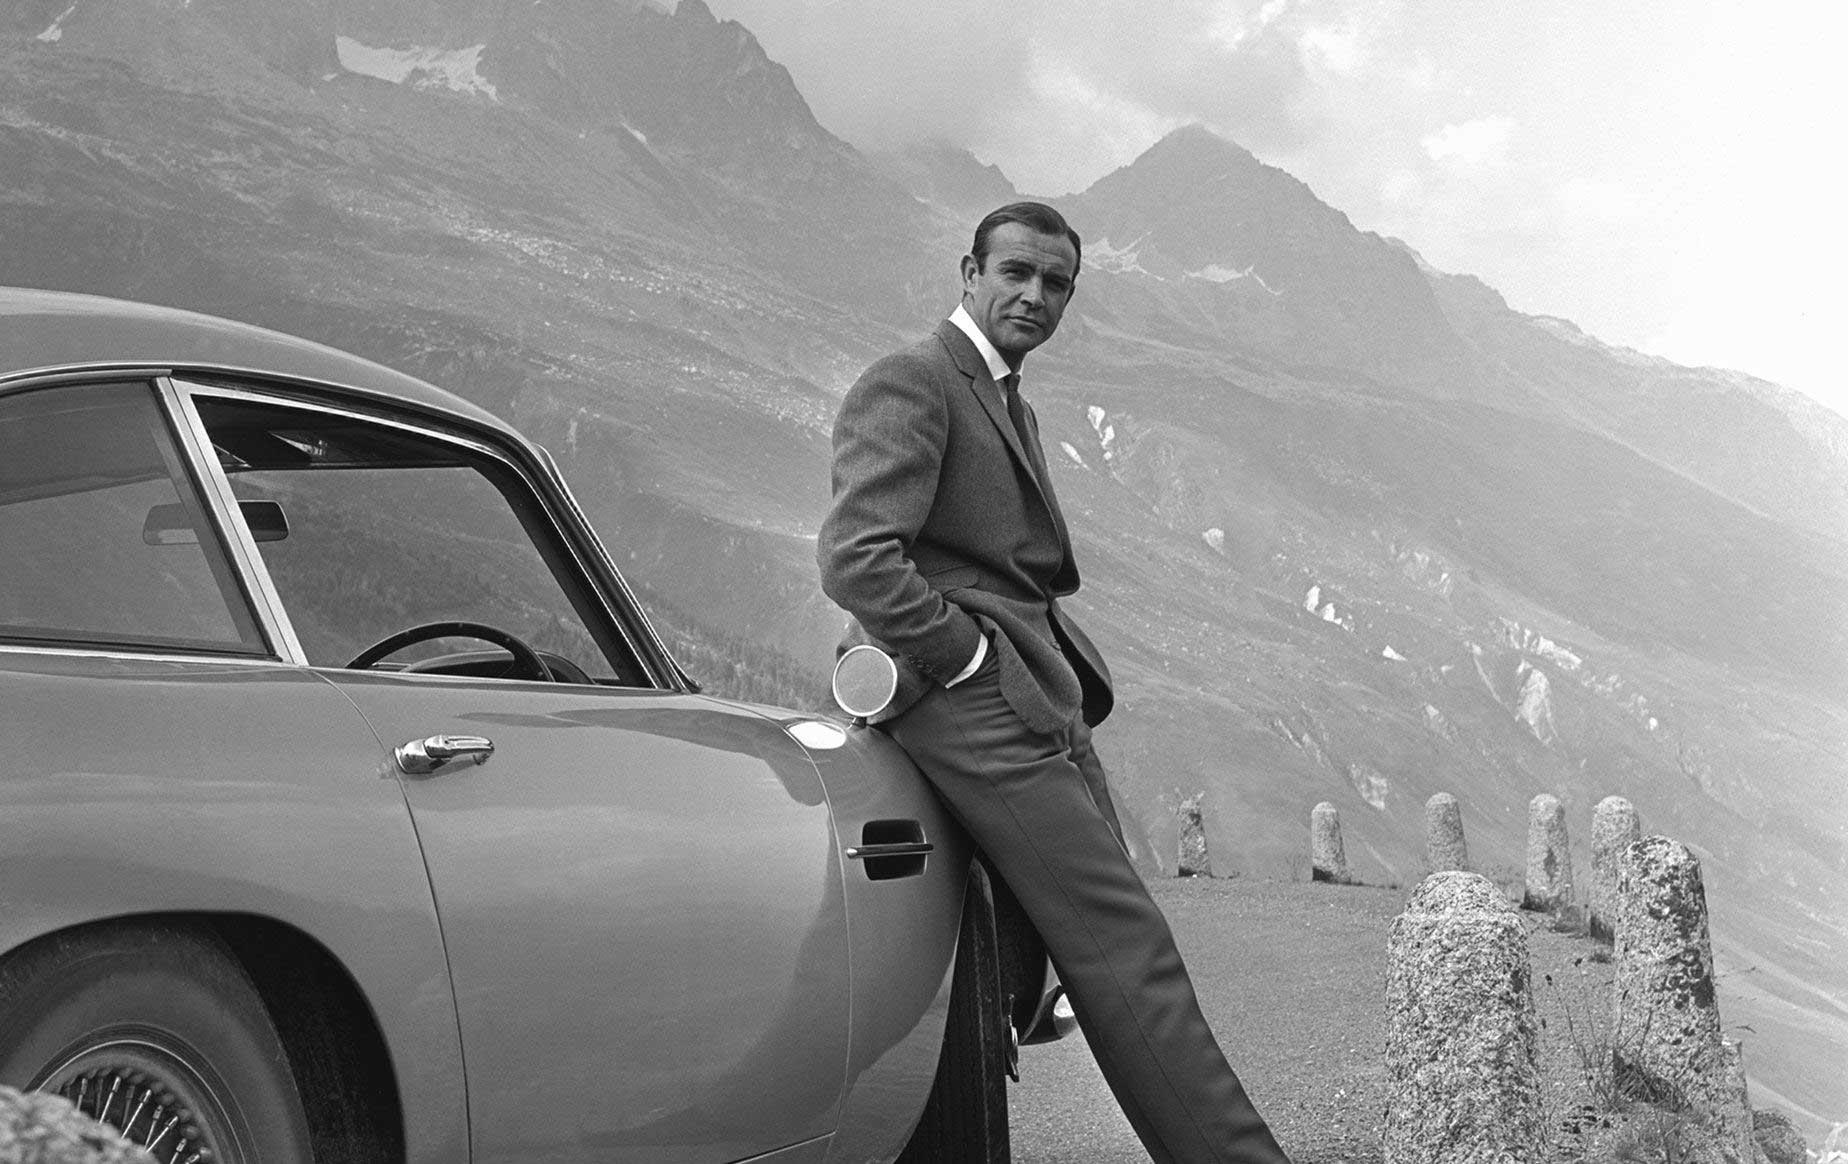 Affiche de James Bond 007, L'Exposition 50 ans de style Bond. Grande Halle de la Villette à partir du 16 avril 2016© 1962-2016 Danjaq, LLC and United Artists Corporation (logo 007) and related James Bond Trademarks are Trademarks of Danjaq, LLC. All Rights Reserved)